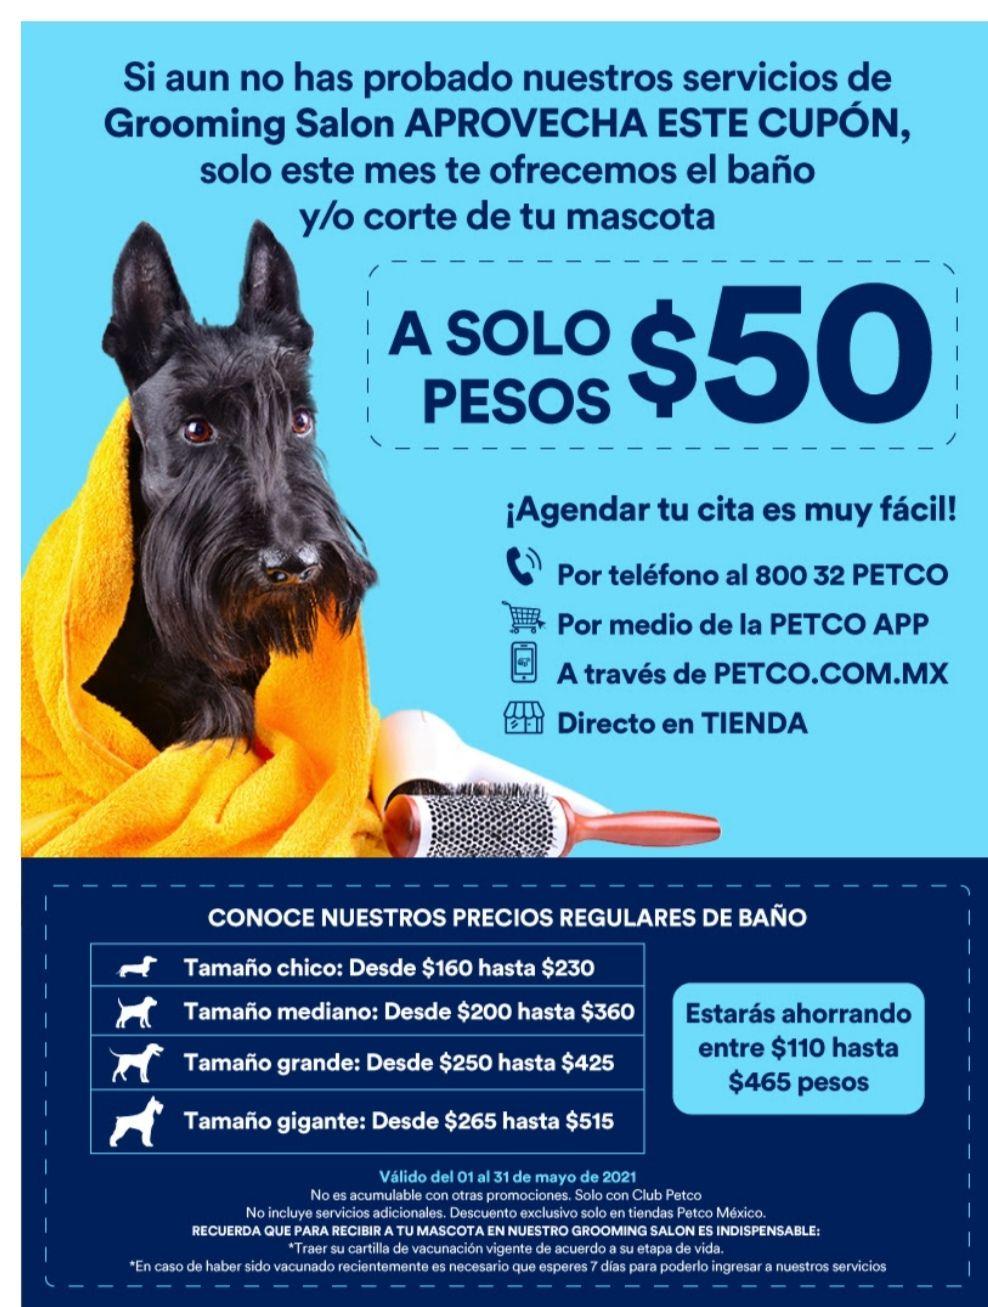 Petco, 1er servicio de baño para tú mascota